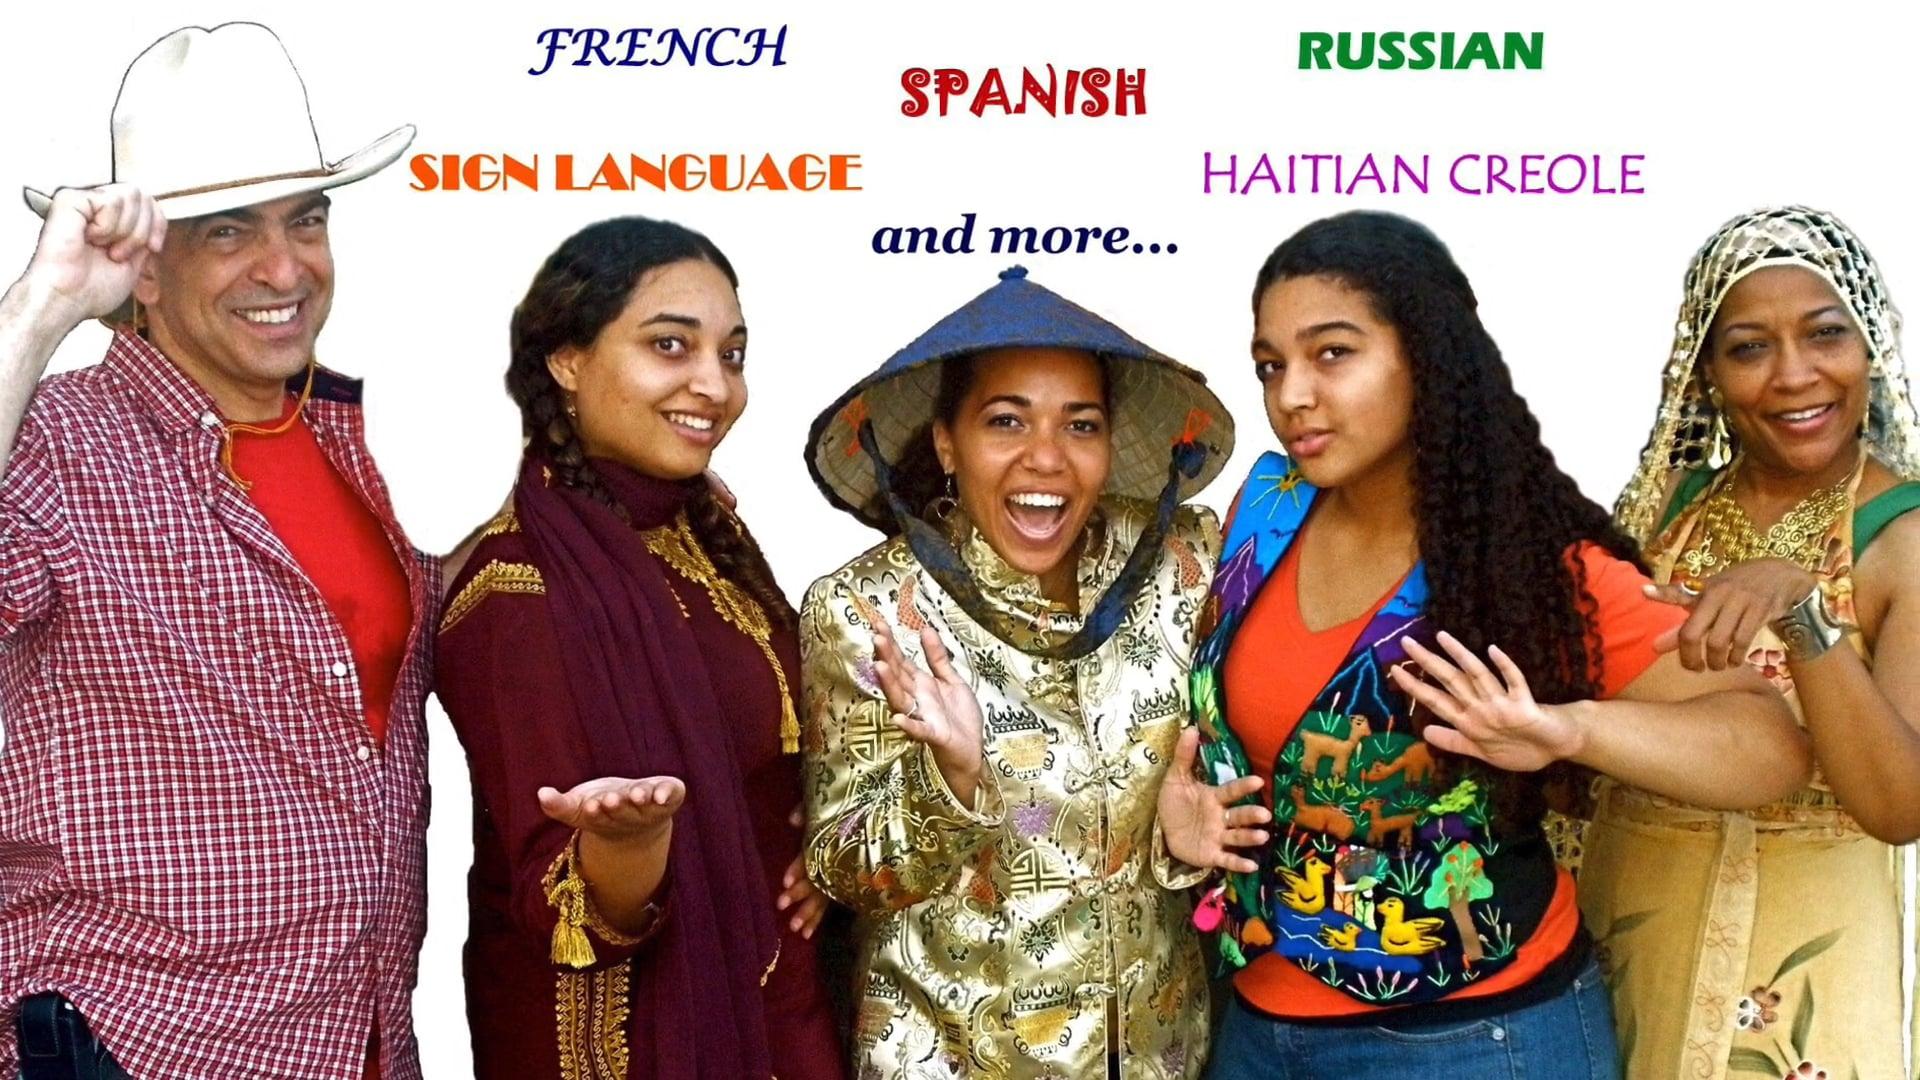 SADARRI & COMPANY ~ Multilingual Storytelling Goes Virtual! (Trailer) VIRTUAL TRAILER